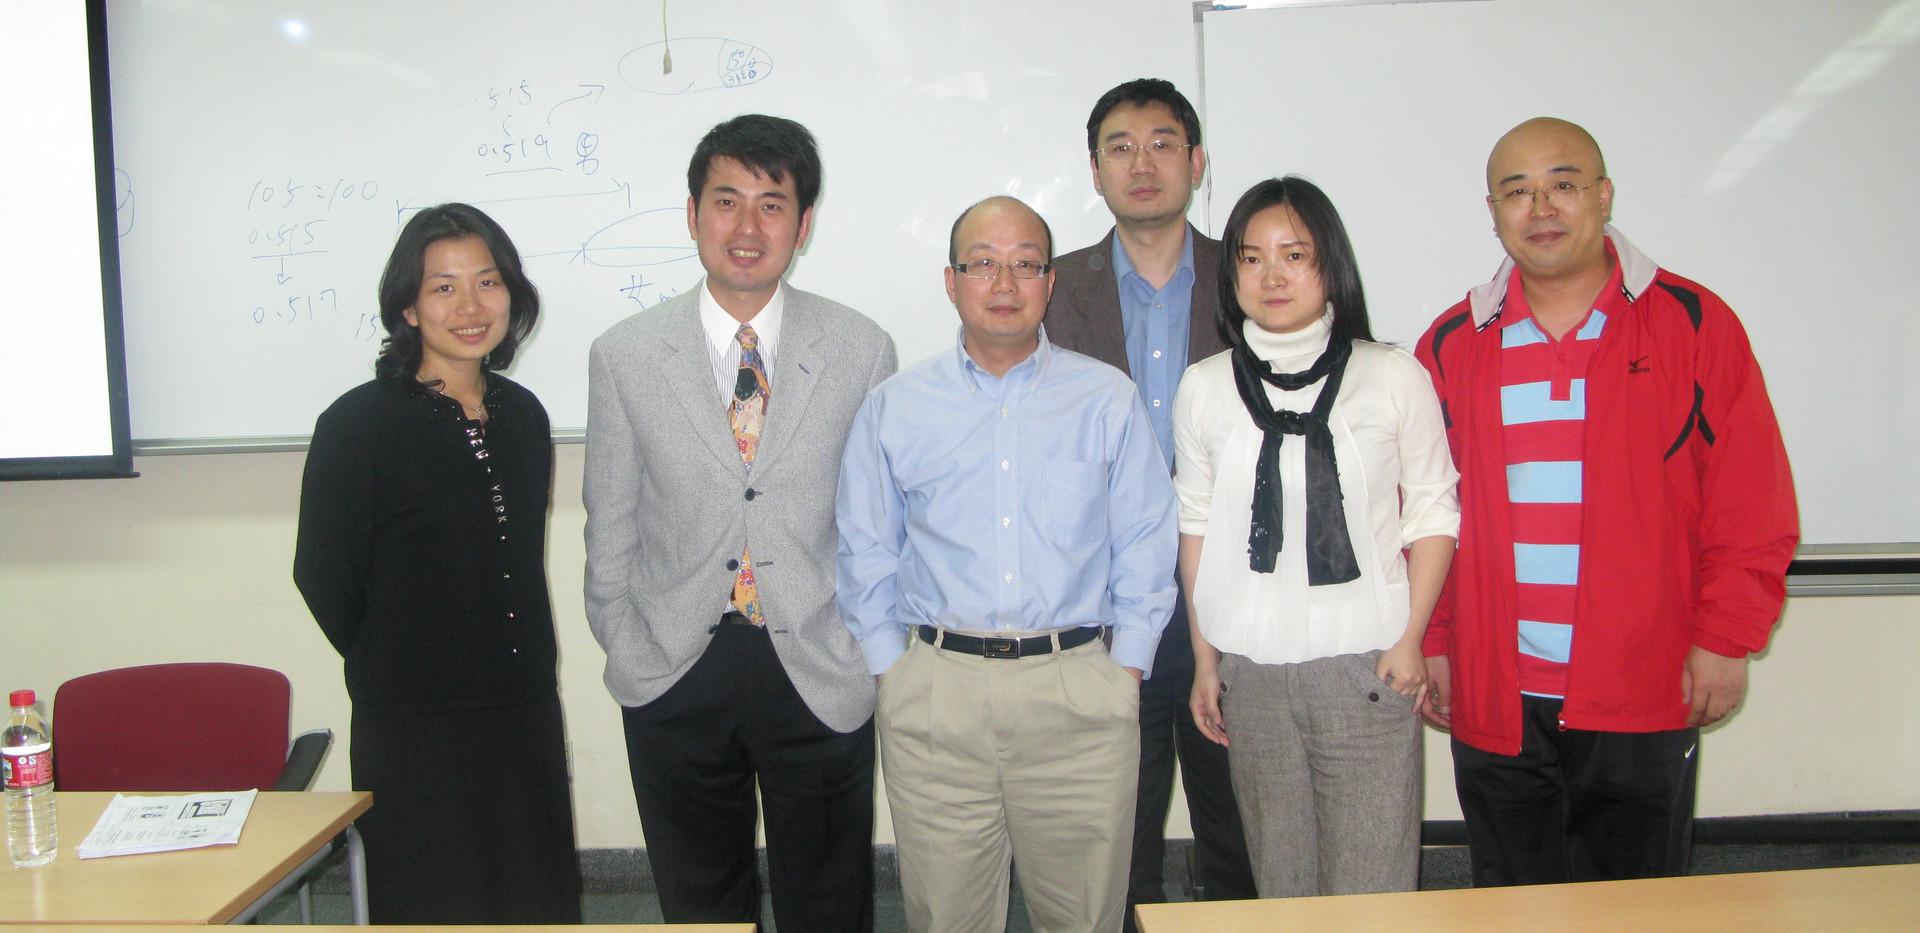 Seminar at Guanghua Management School, Beijing University 2008